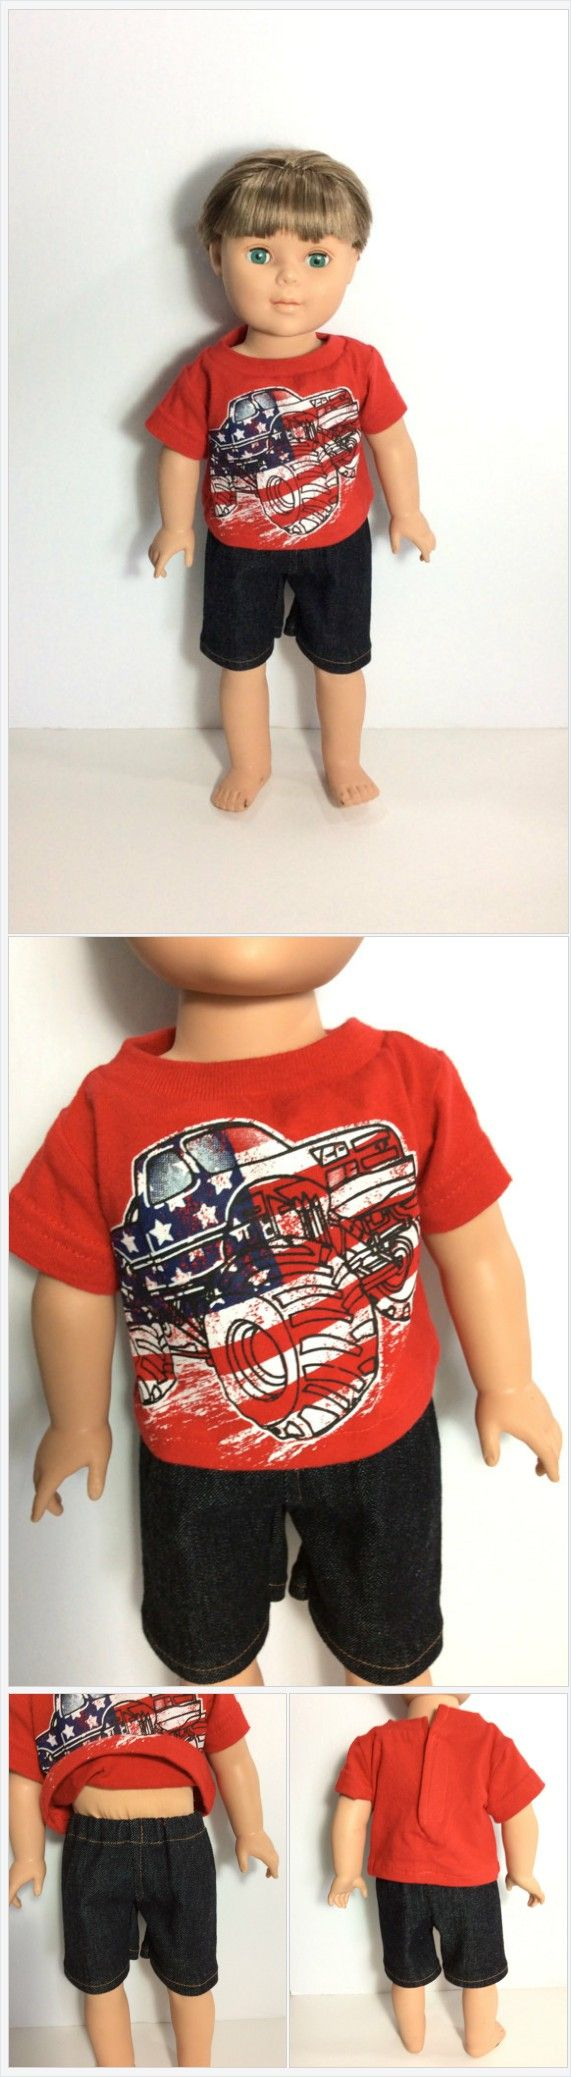 18 Inch Boy Doll Patriotic T-shirt with Jean Shorts, Red Monster Truck Shirt, Black Denim Shorts, 4th of July Shirt, Boy Doll Clothes